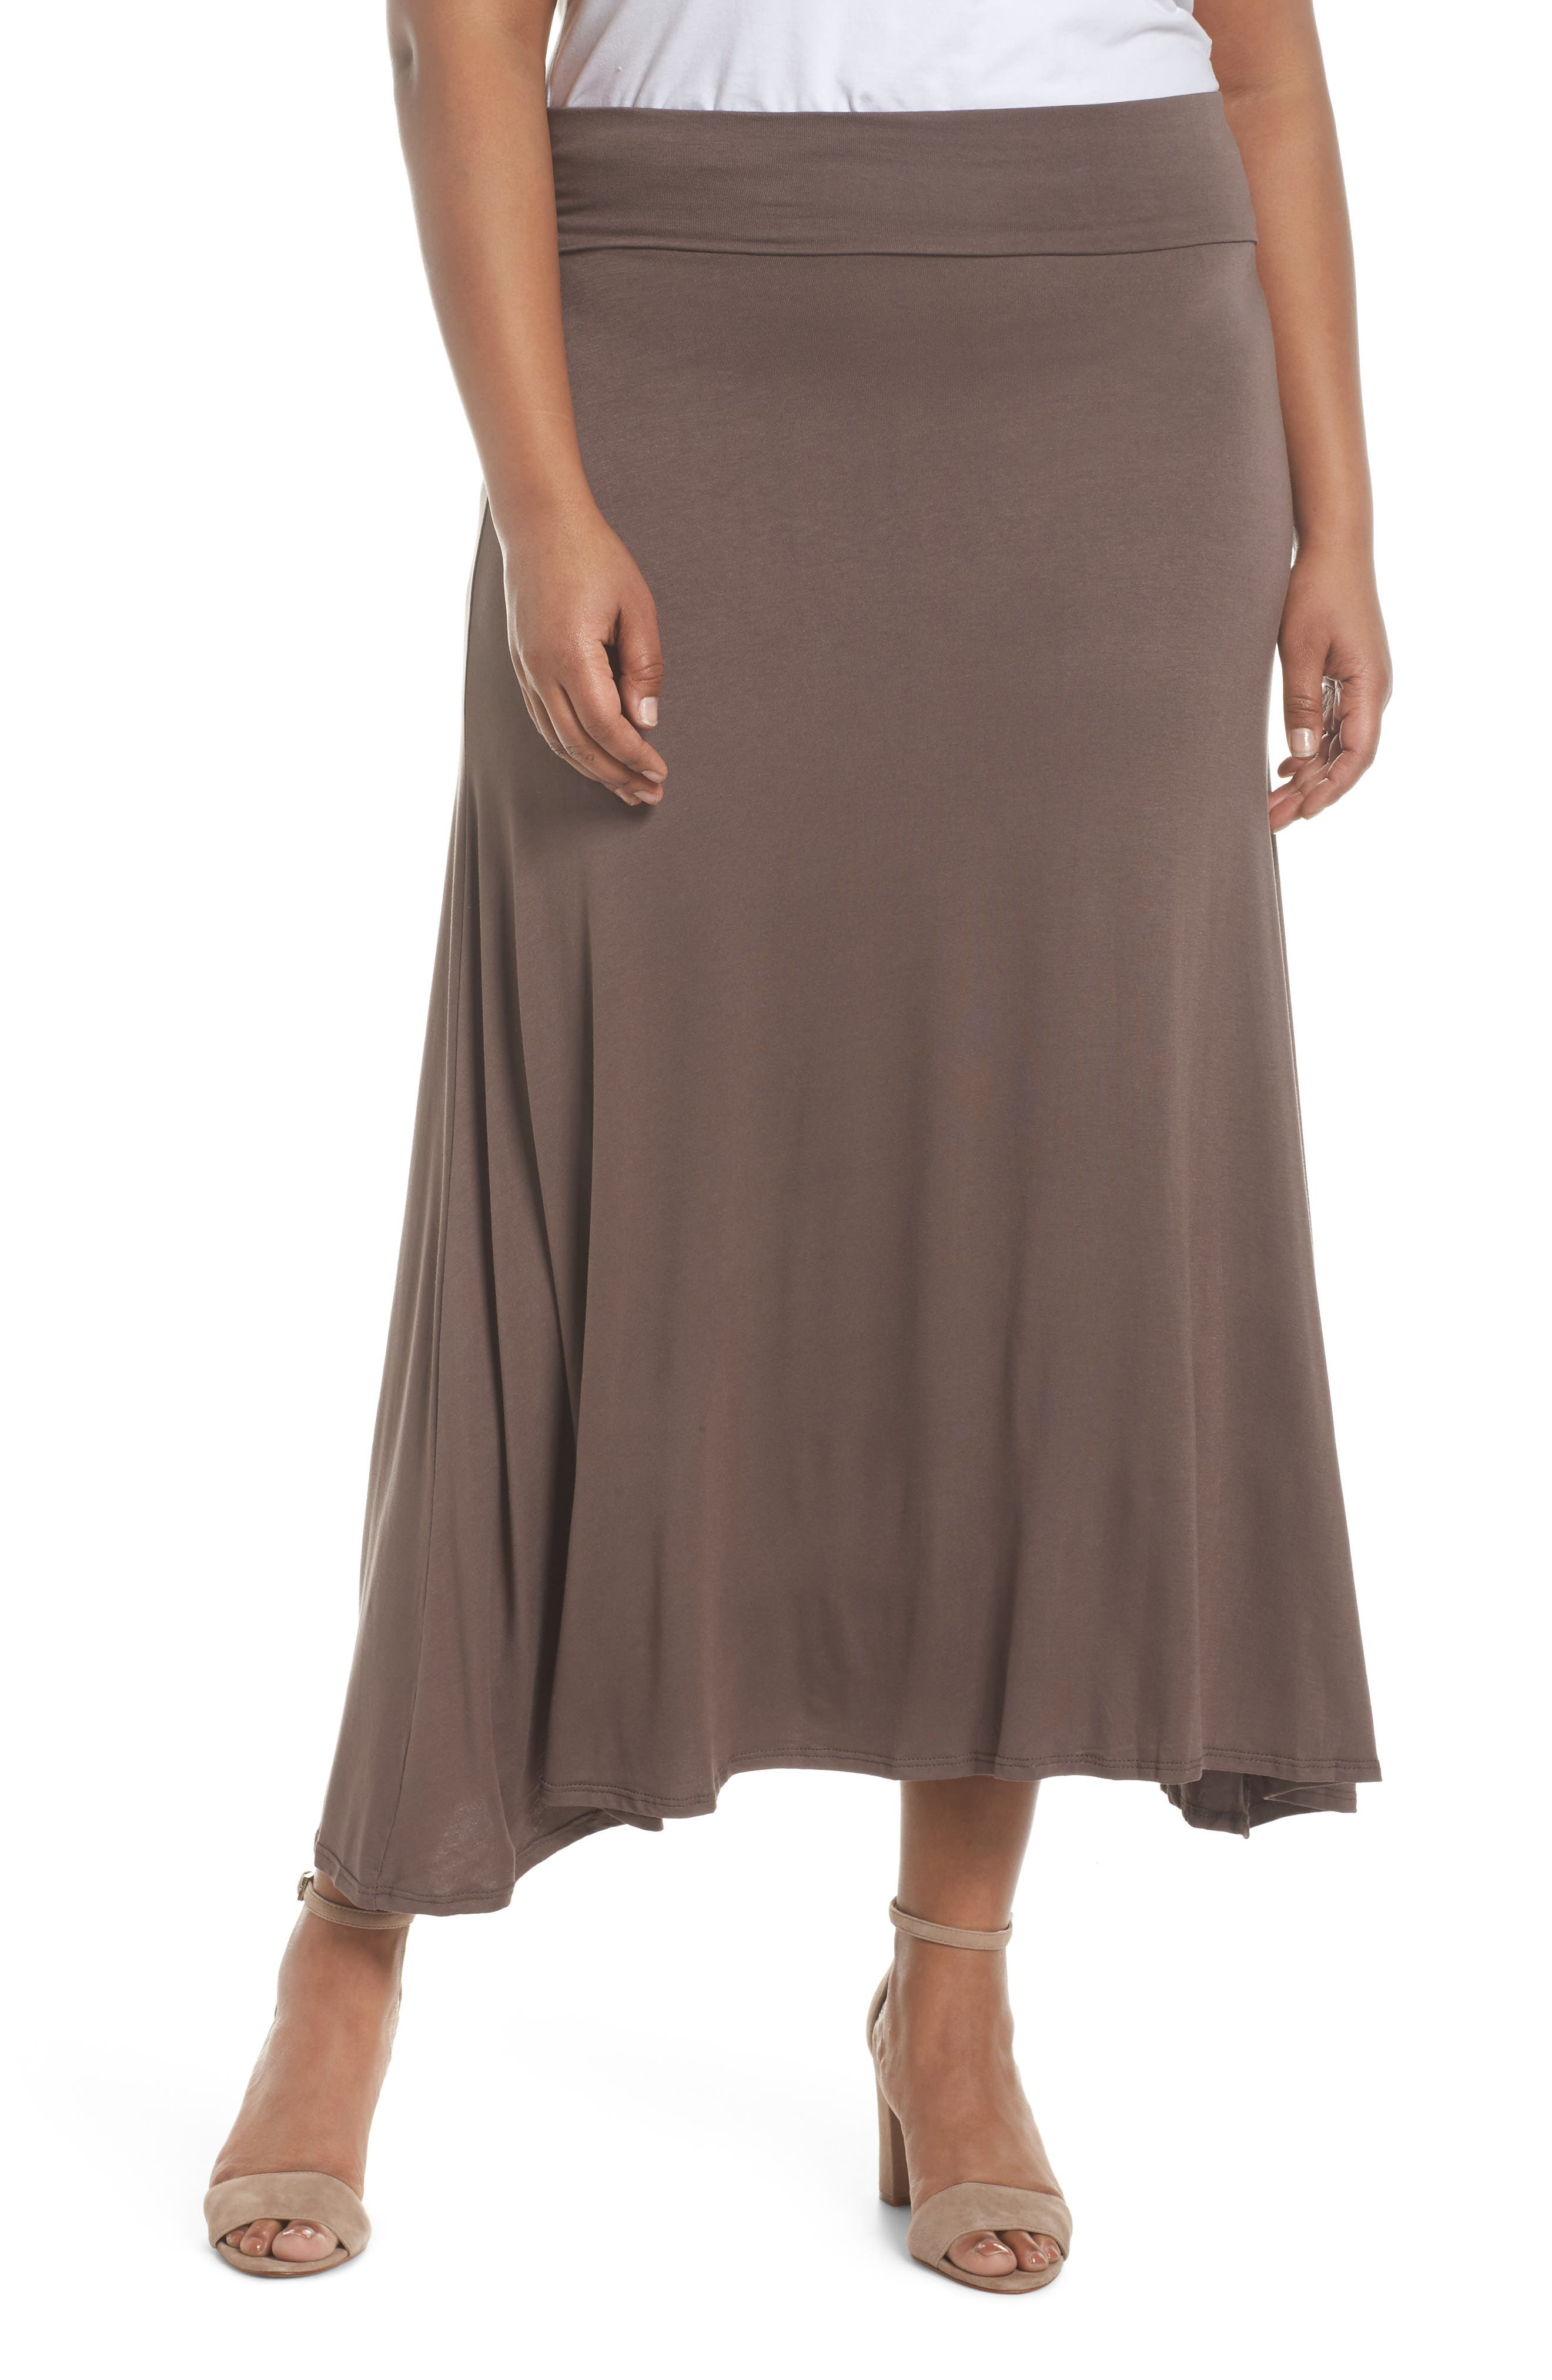 Soprano Foldover Knit Skirt